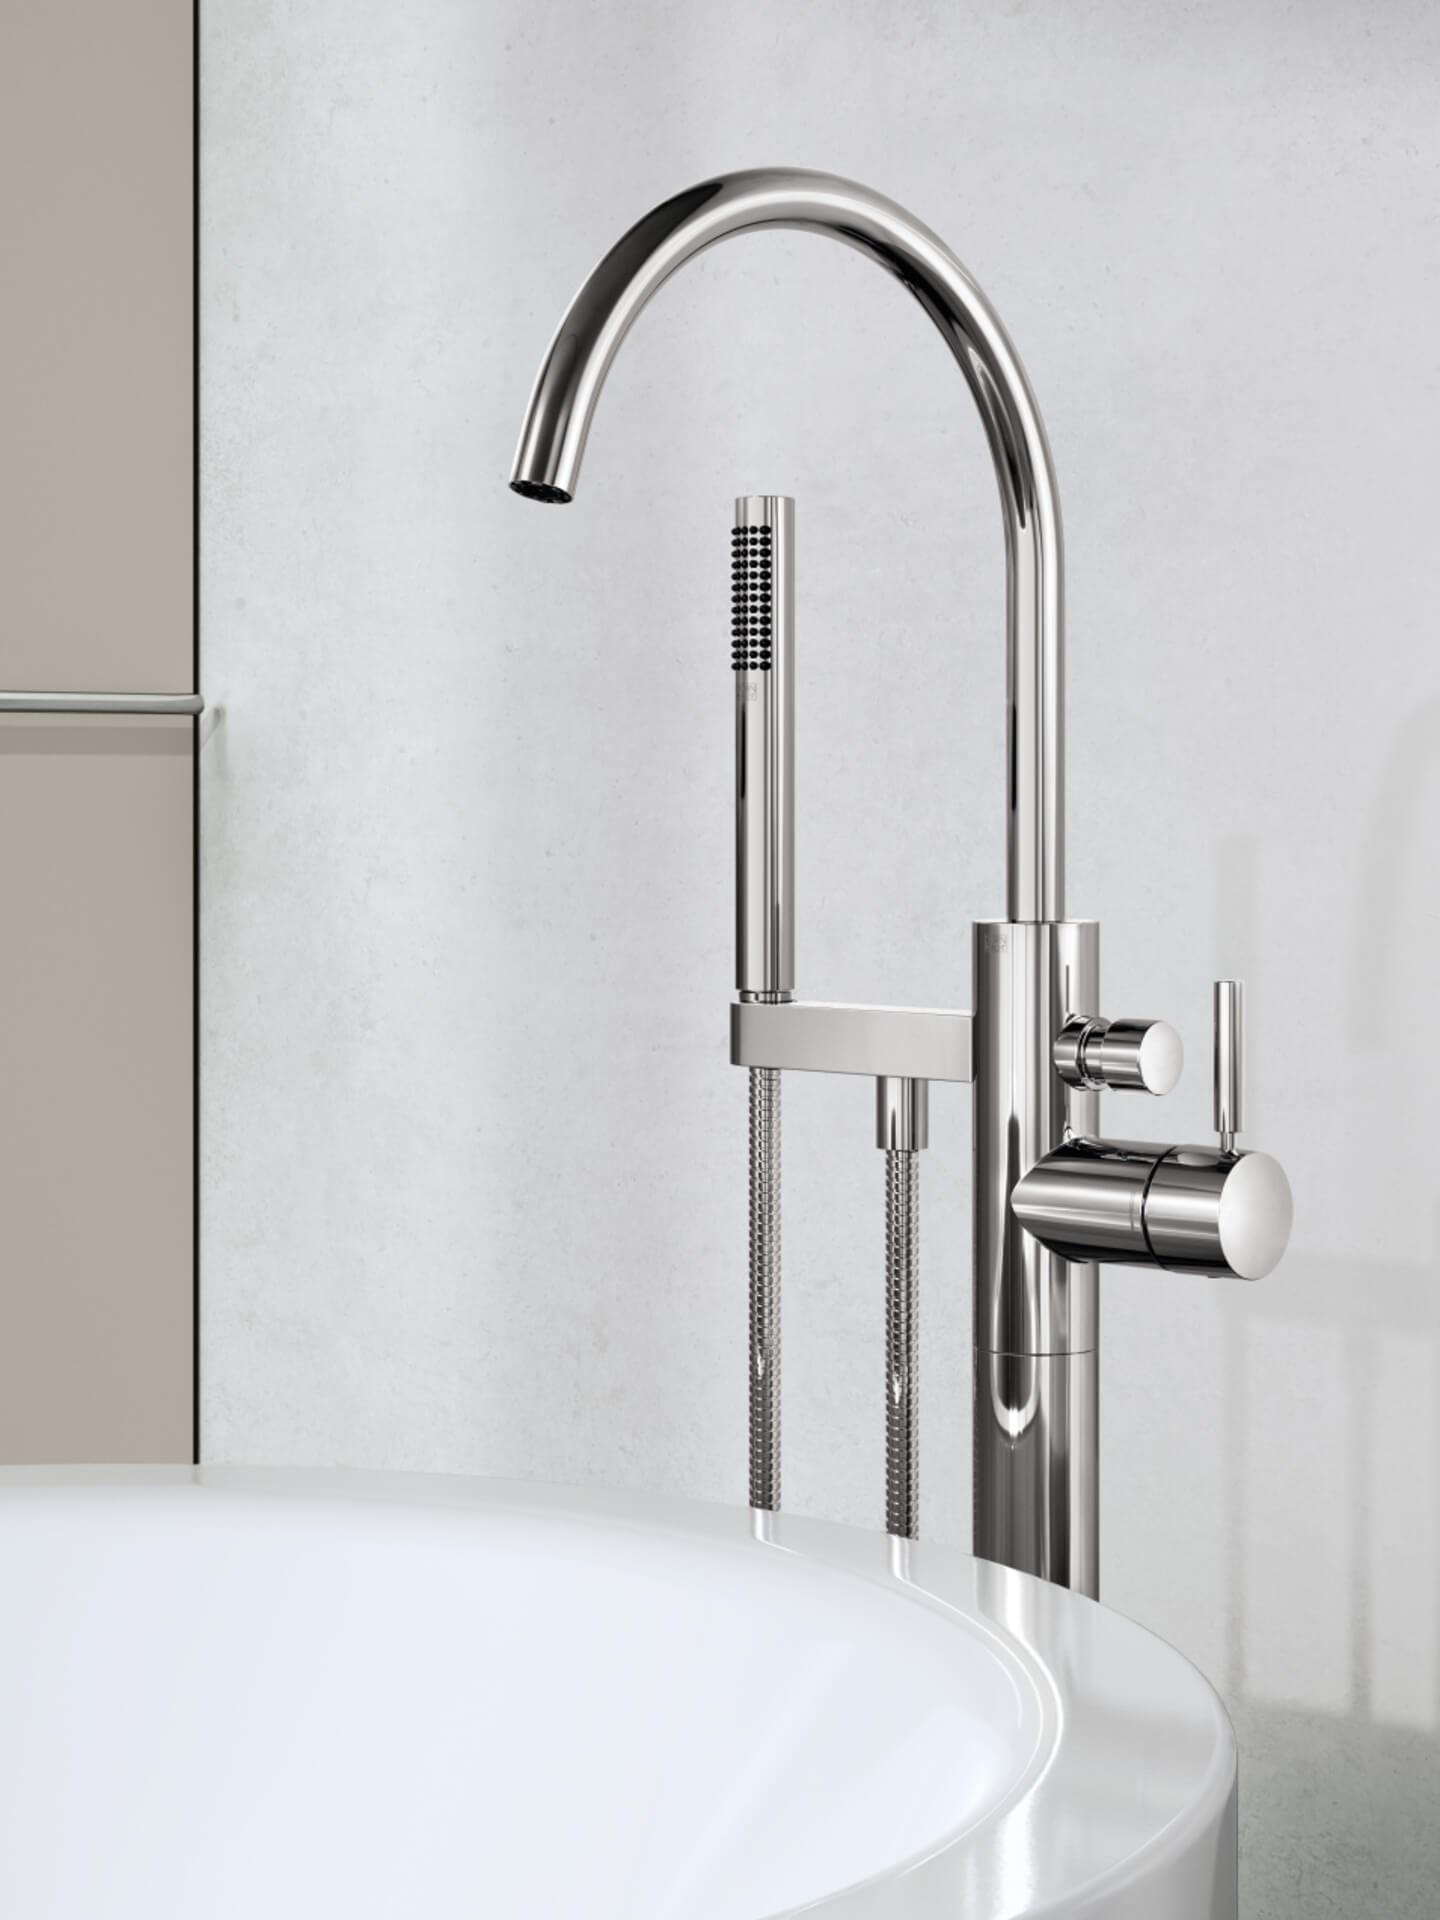 Miljøbilde badekararmatur META 25863661 Dornbracht i krom. Nærbildde på beige bad.